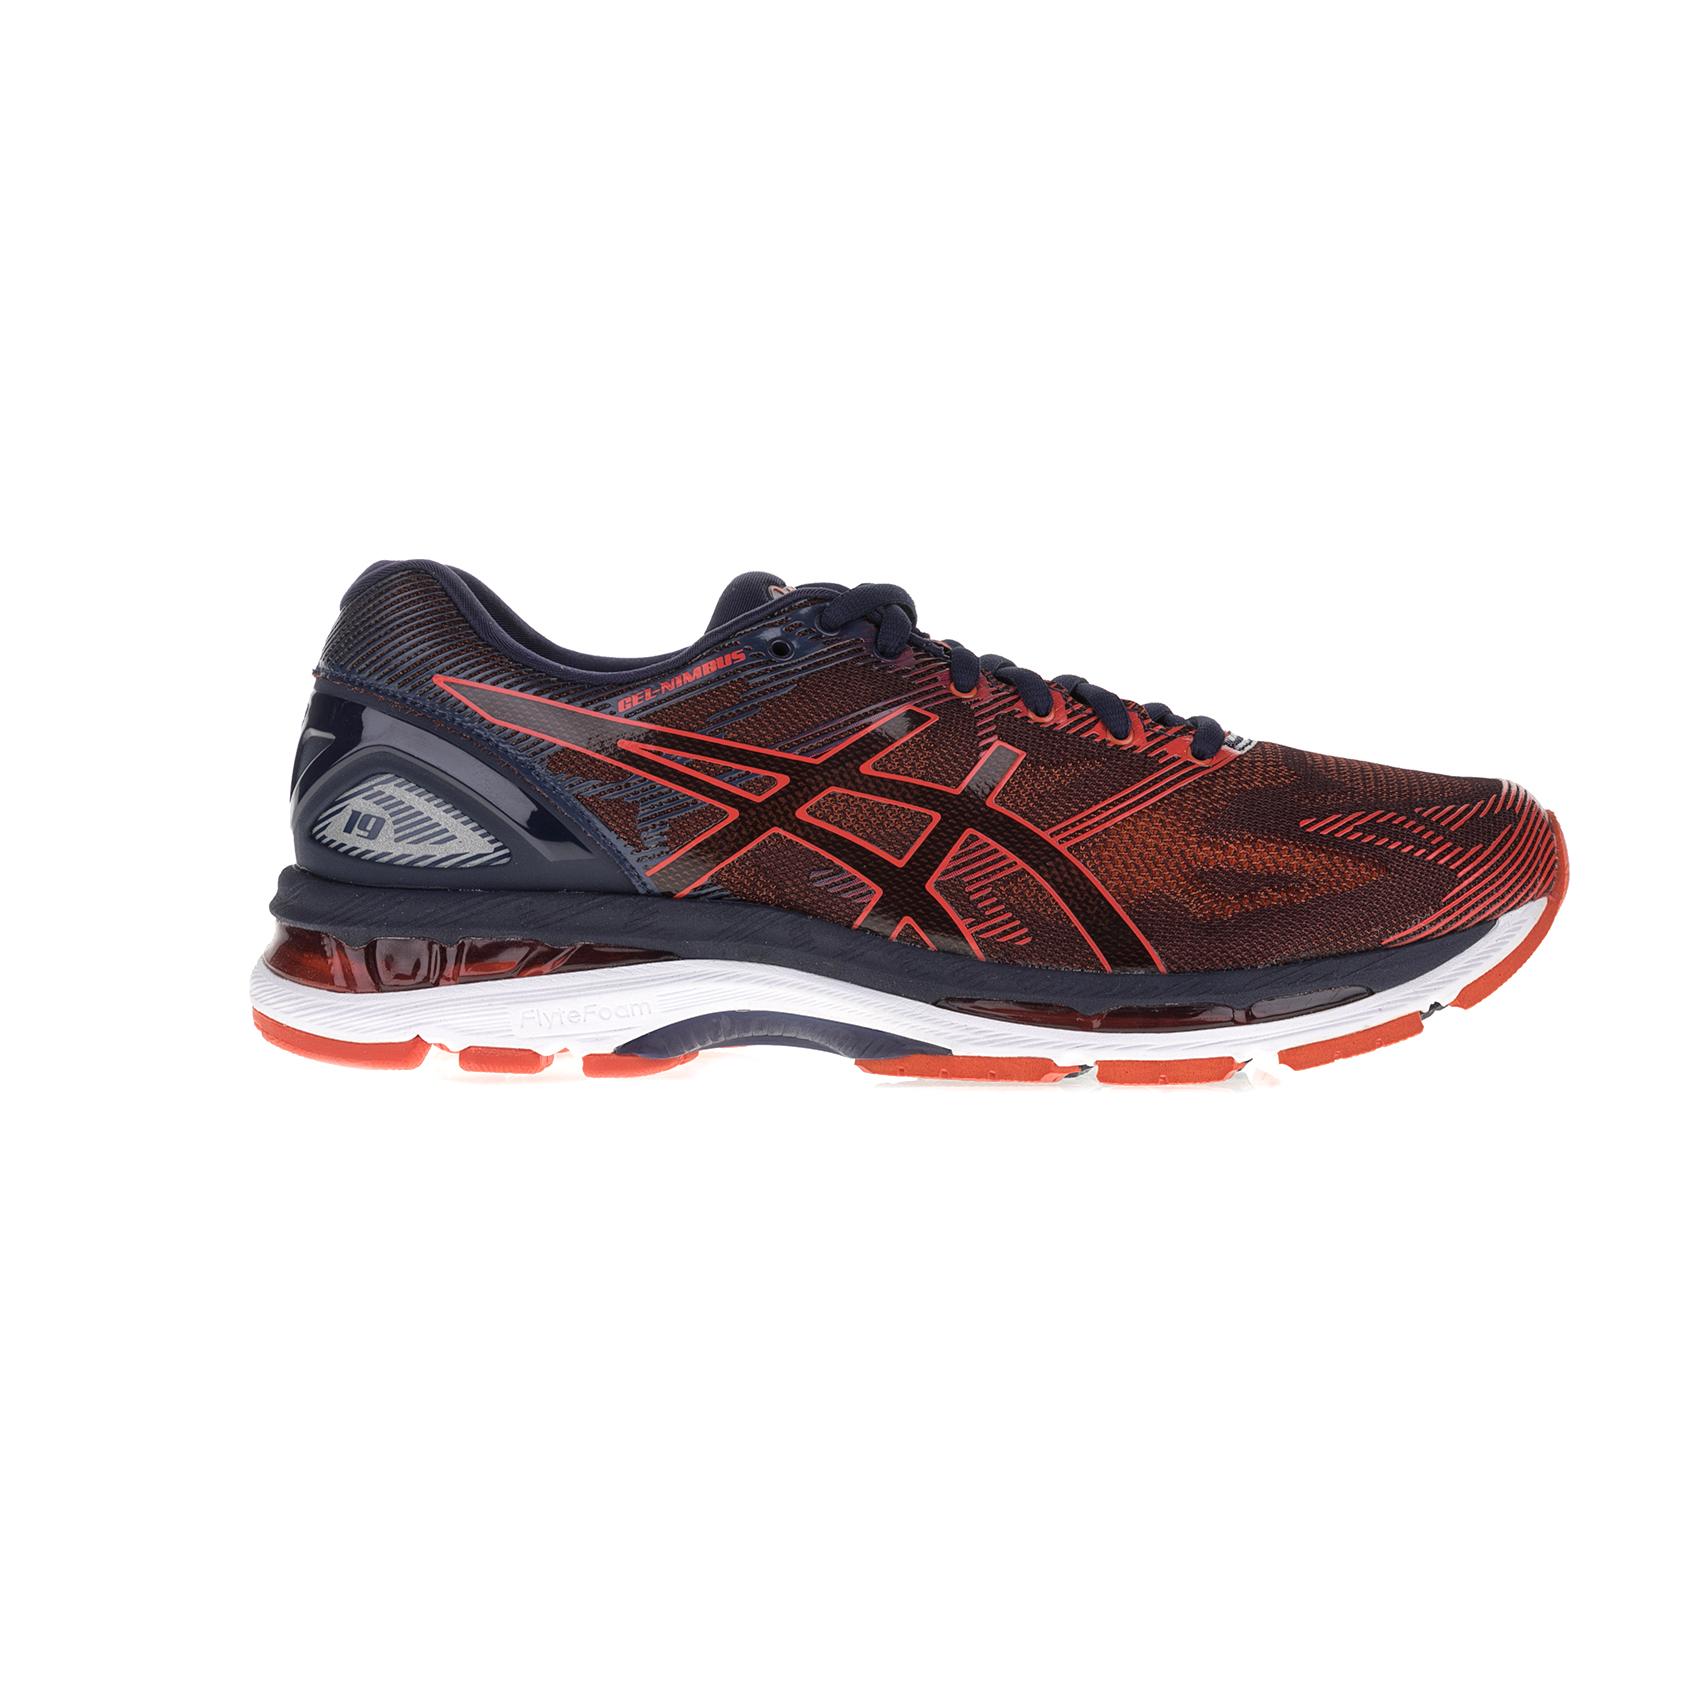 ASICS - Ανδρικά παπούτσια ASICS GEL-NIMBUS 19 πορτοκαλί ανδρικά παπούτσια αθλητικά running